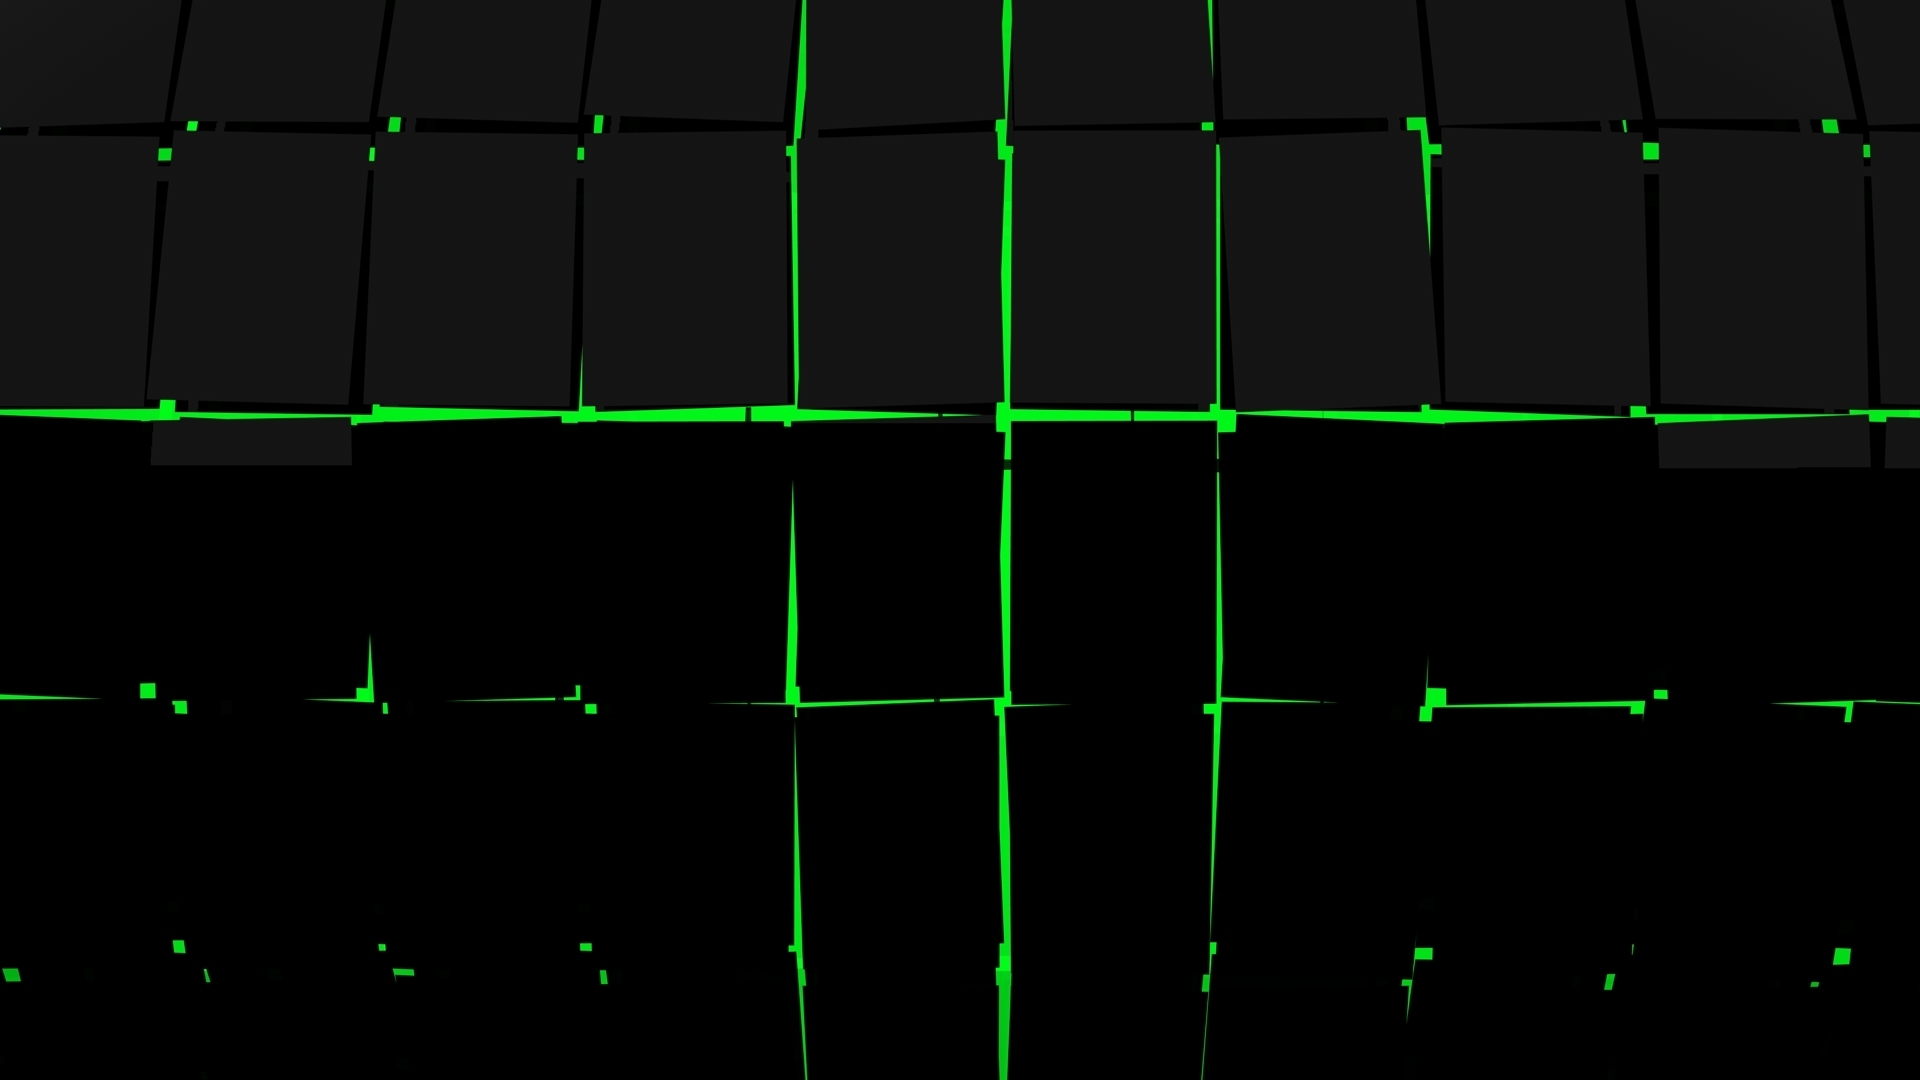 black and green wall full hd fond d'écran and arrière-plan